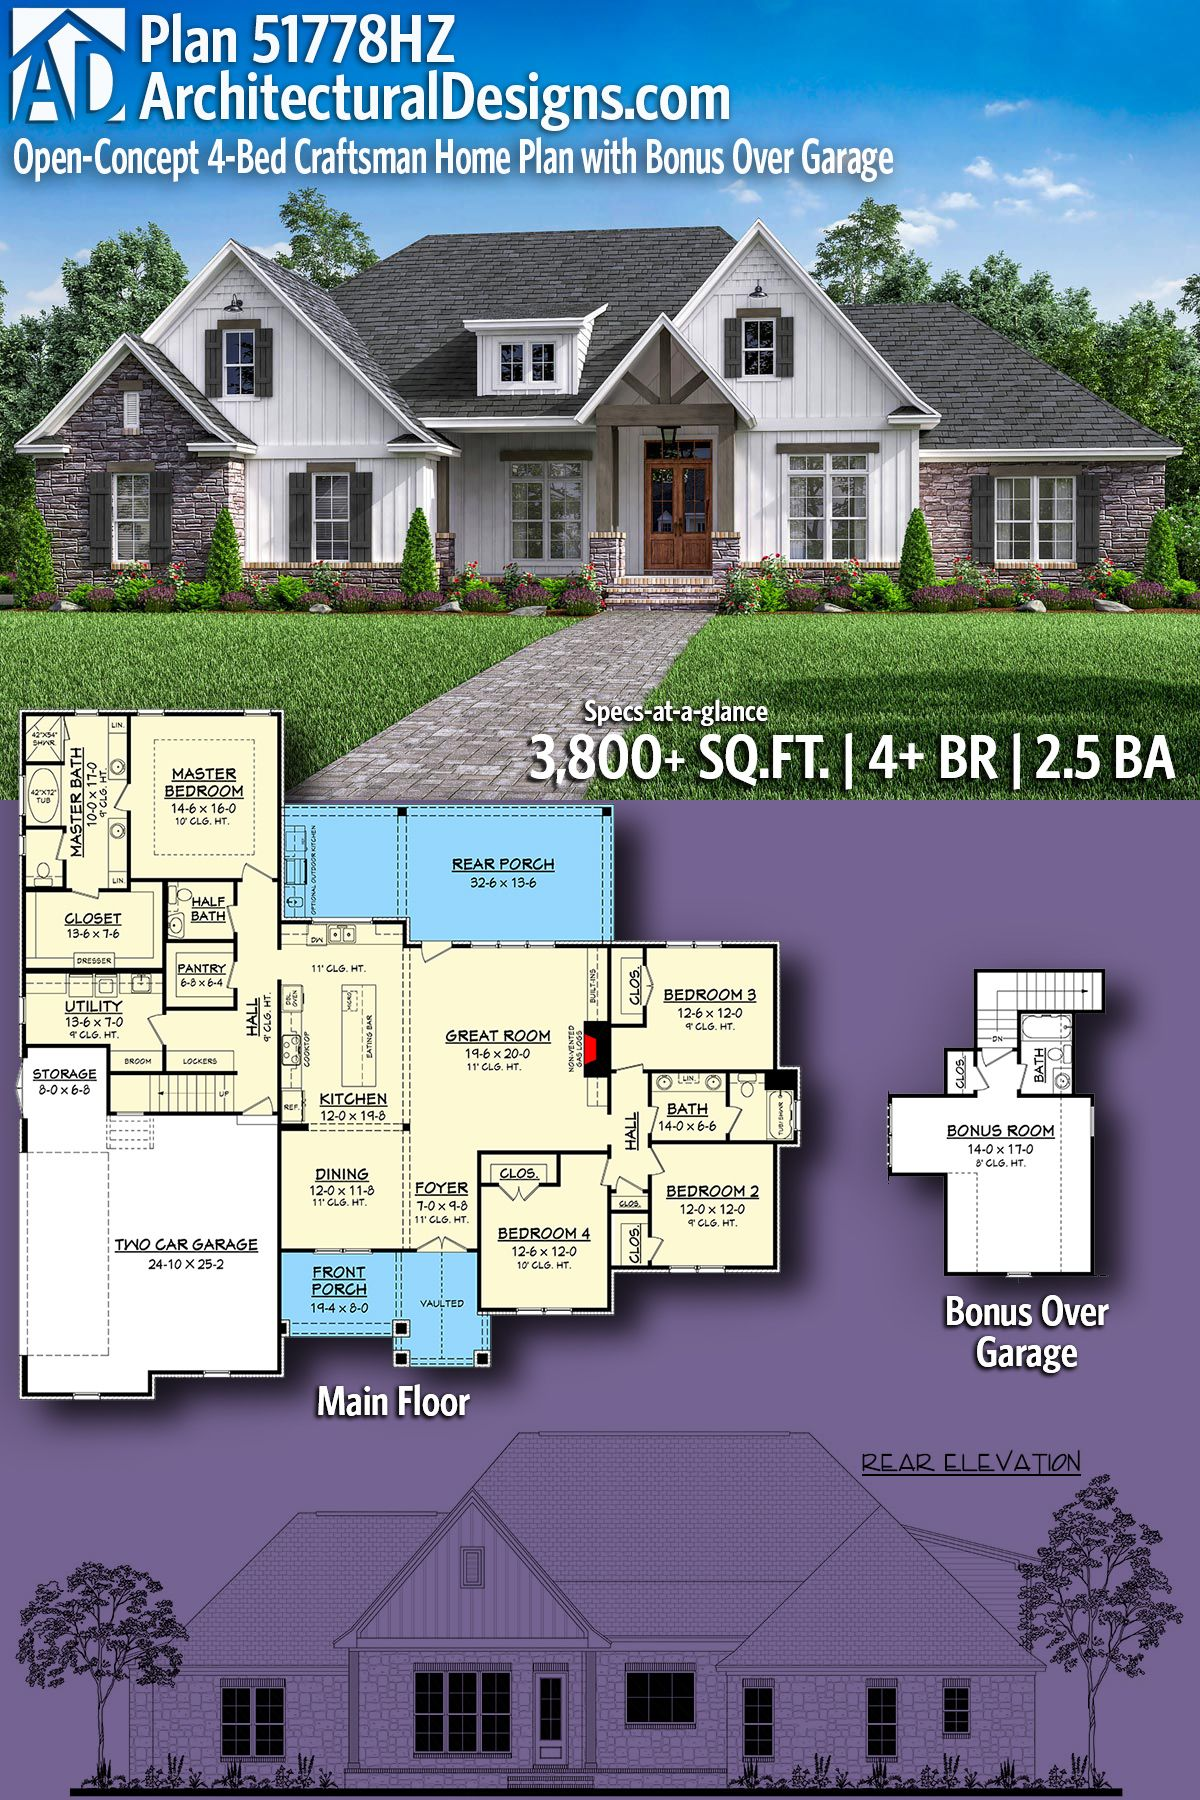 Plan 51778hz Open Concept 4 Bed Craftsman Home Plan With Bonus Over Garage Craftsman House Plans House Plans Craftsman House